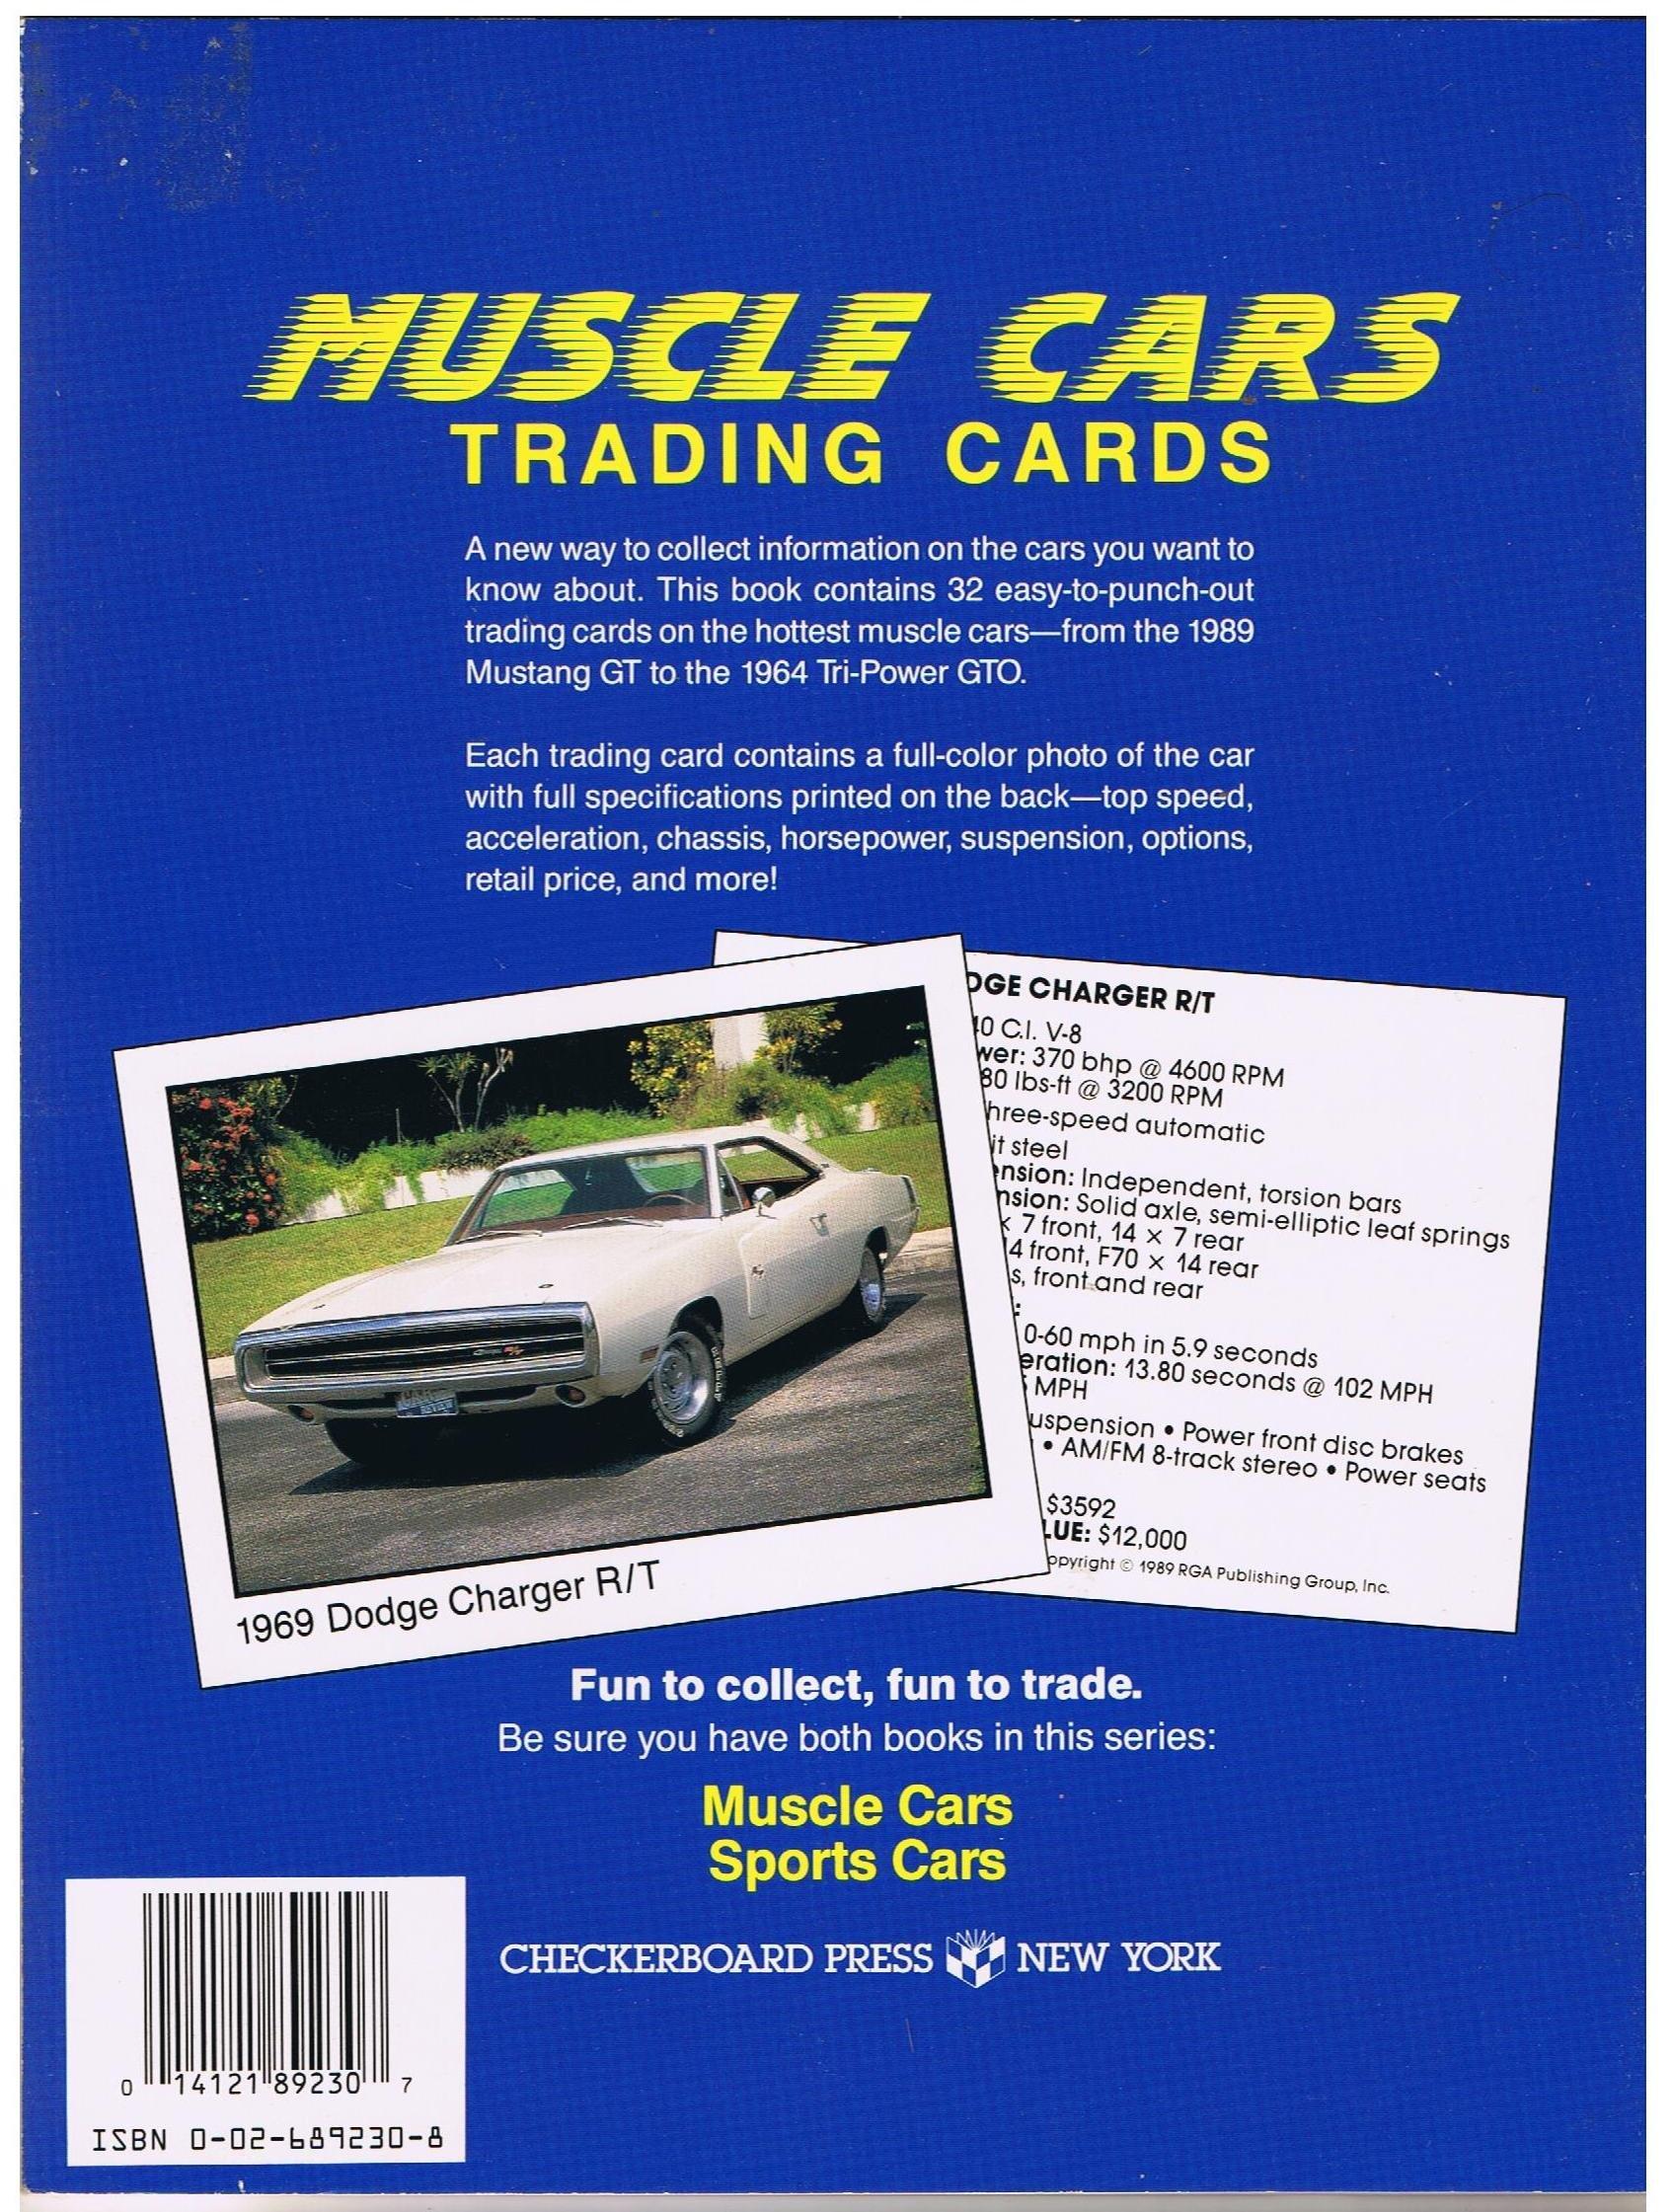 Muscle Cars Trading Cards: Alain Chirinian: Amazon.com: Books